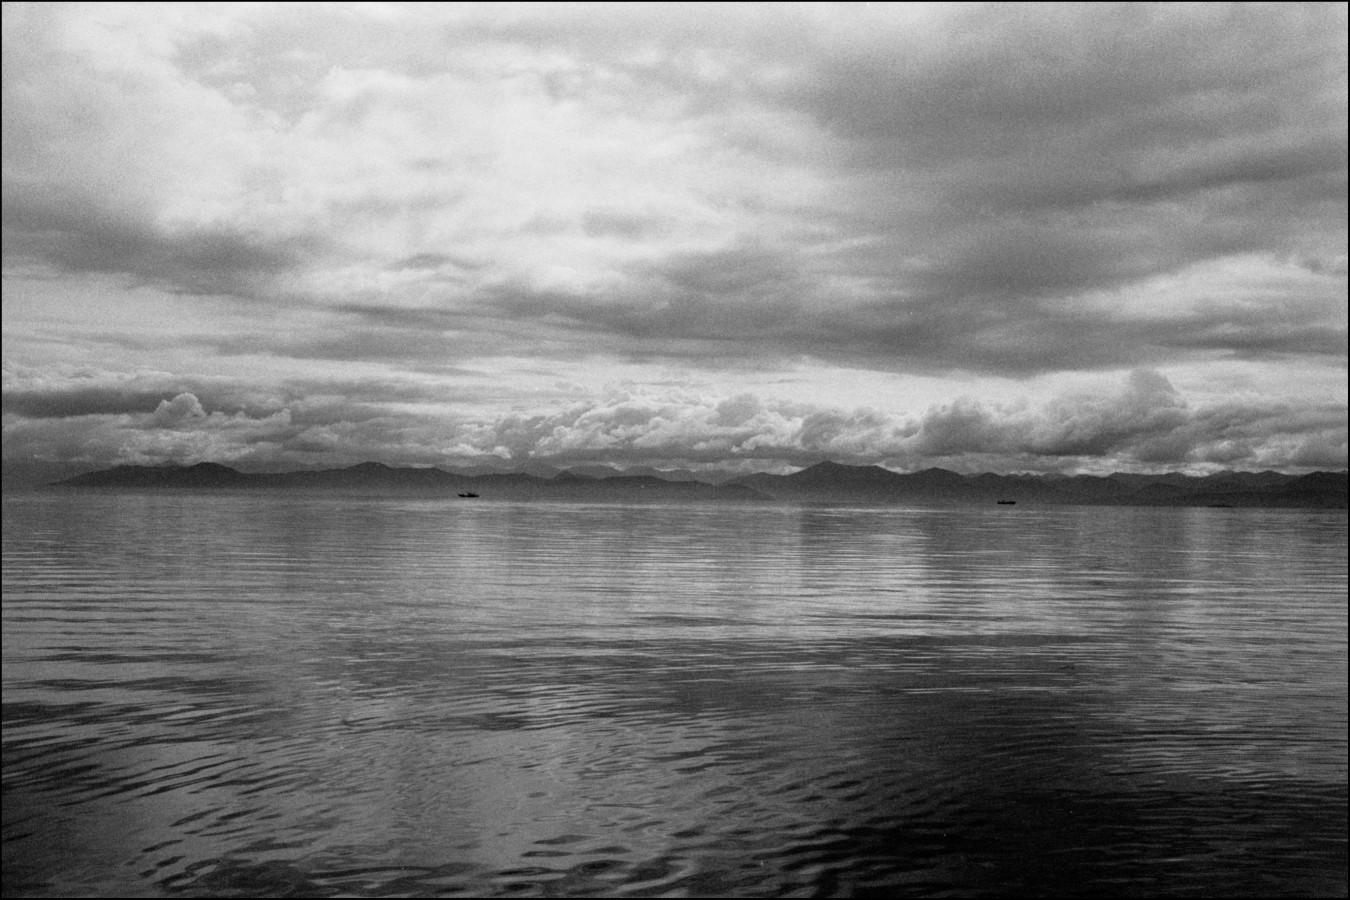 The japanese sea, Petropavlovsk, Kamshatka